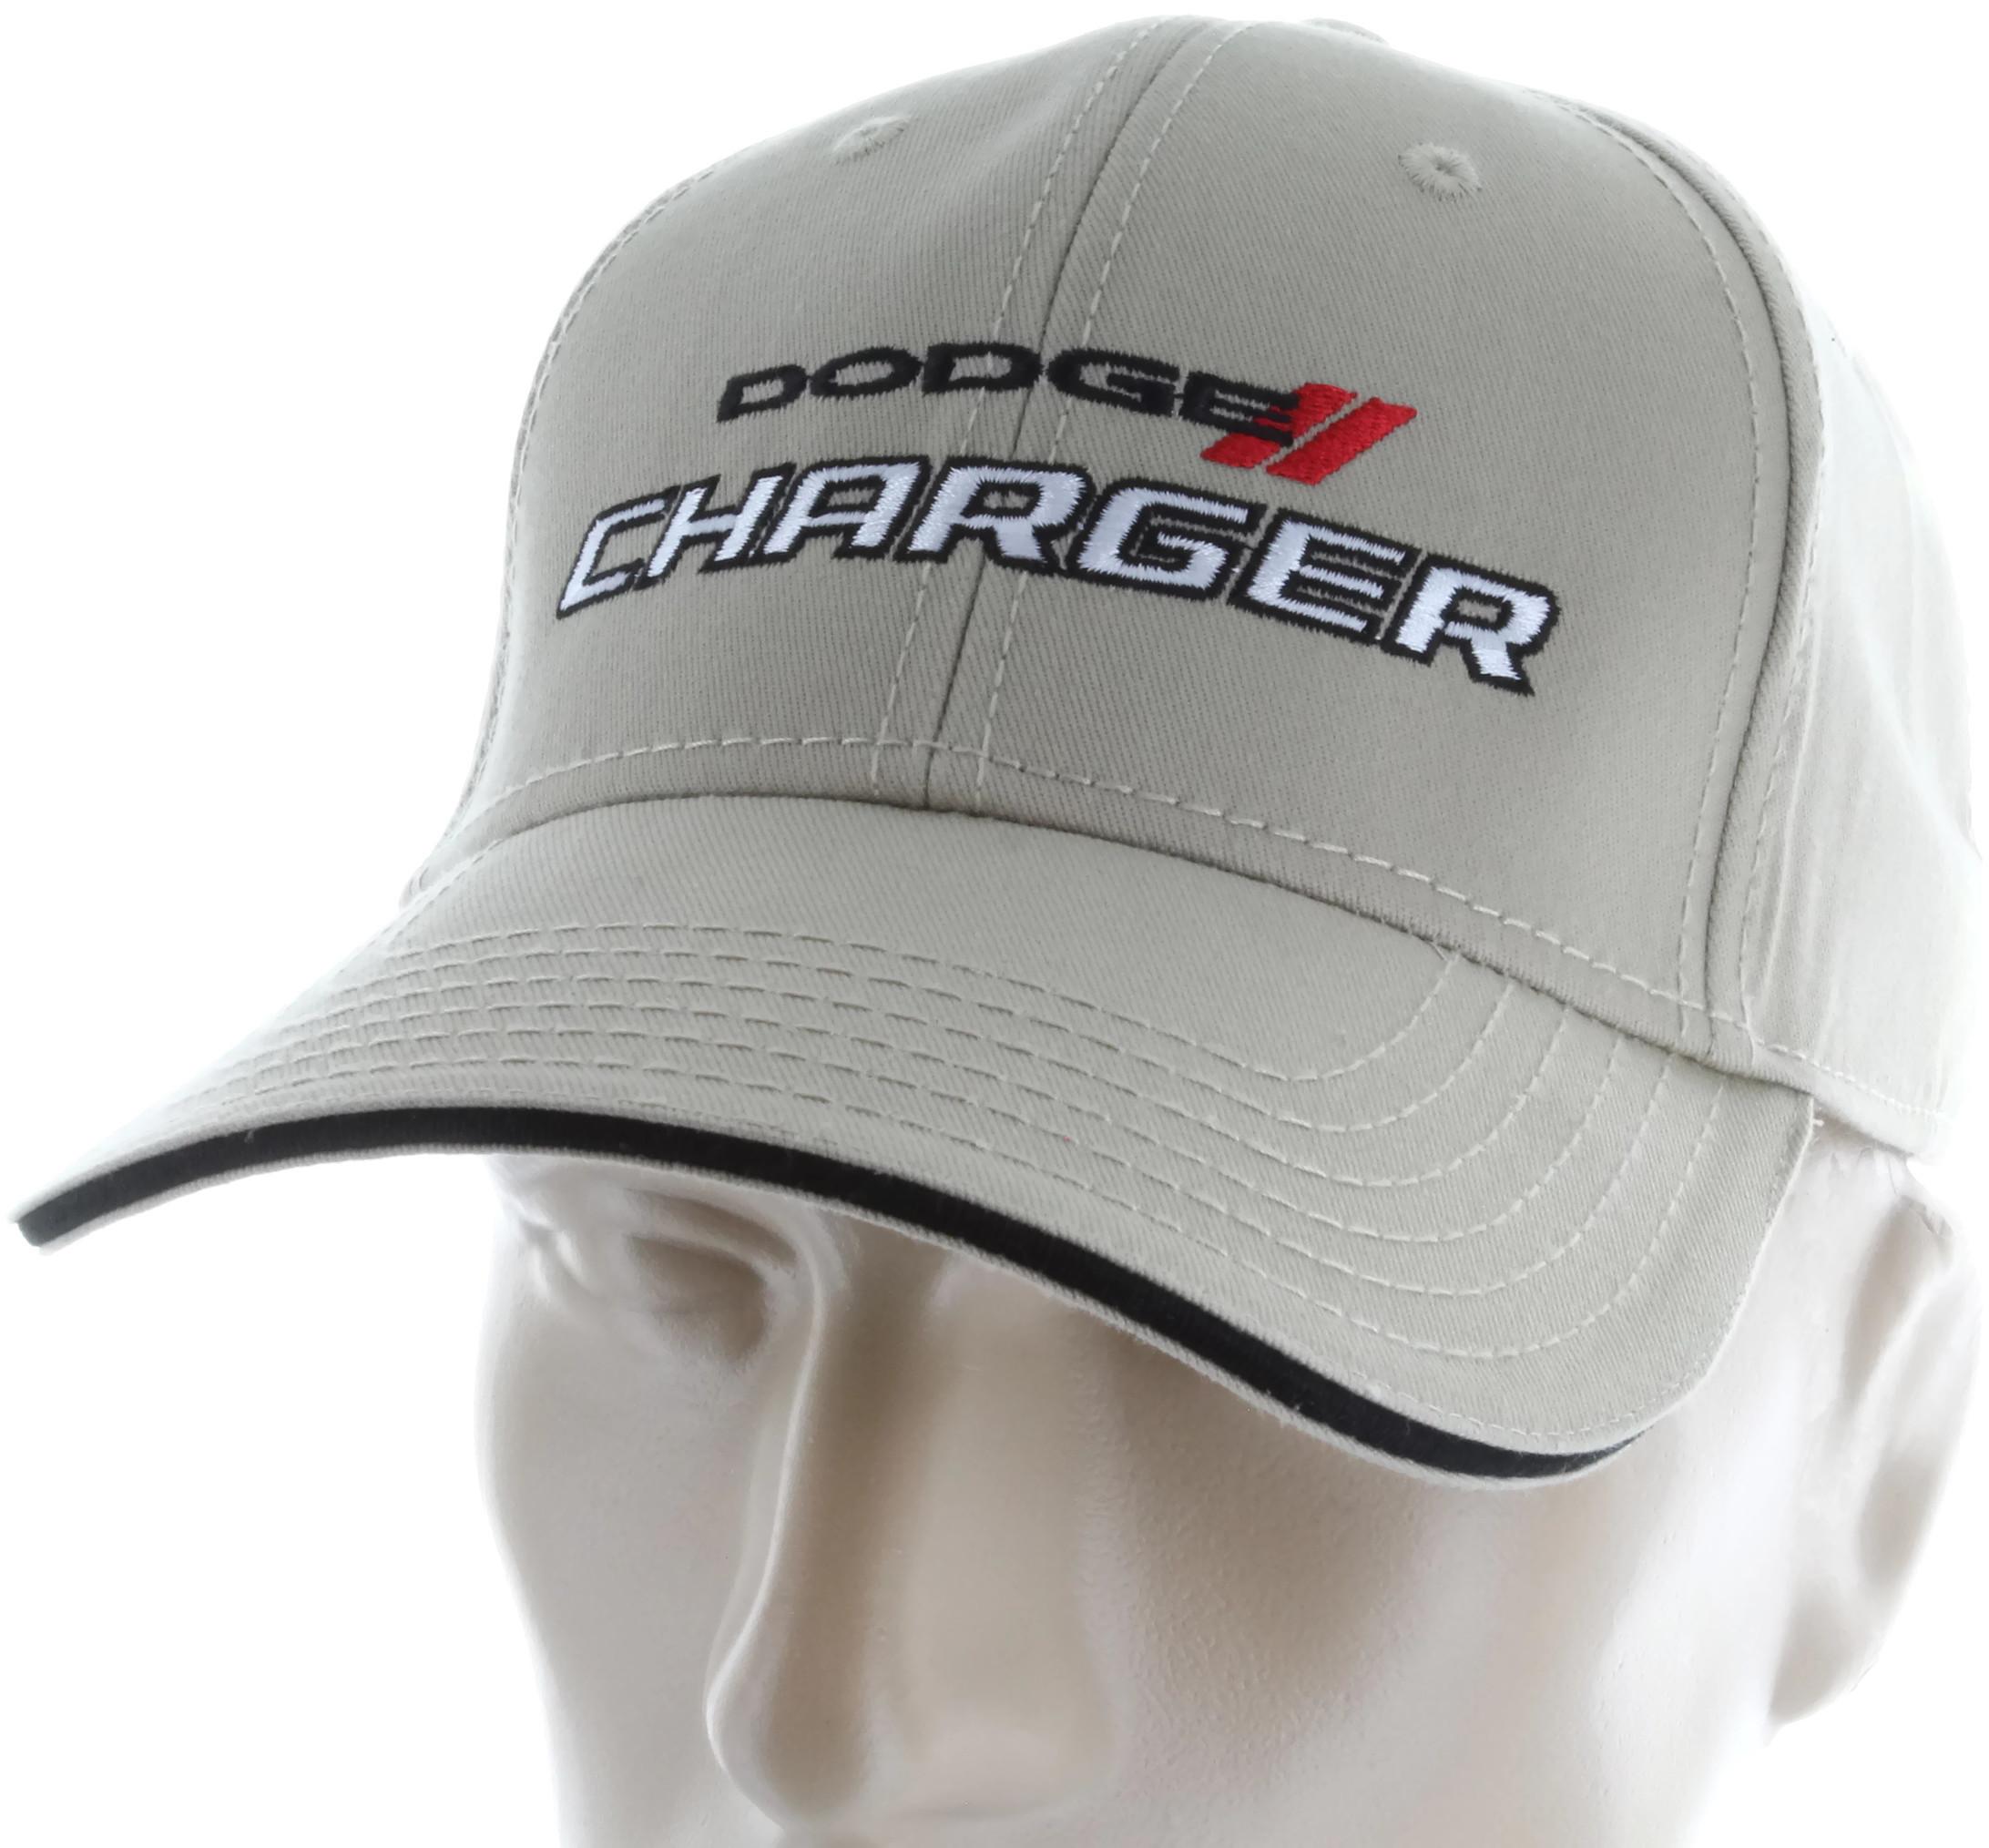 c3bcb178a3f Details about Dodge Charger RT Tan Baseball Cap Trucker Hat Snapback SRT  Mopar